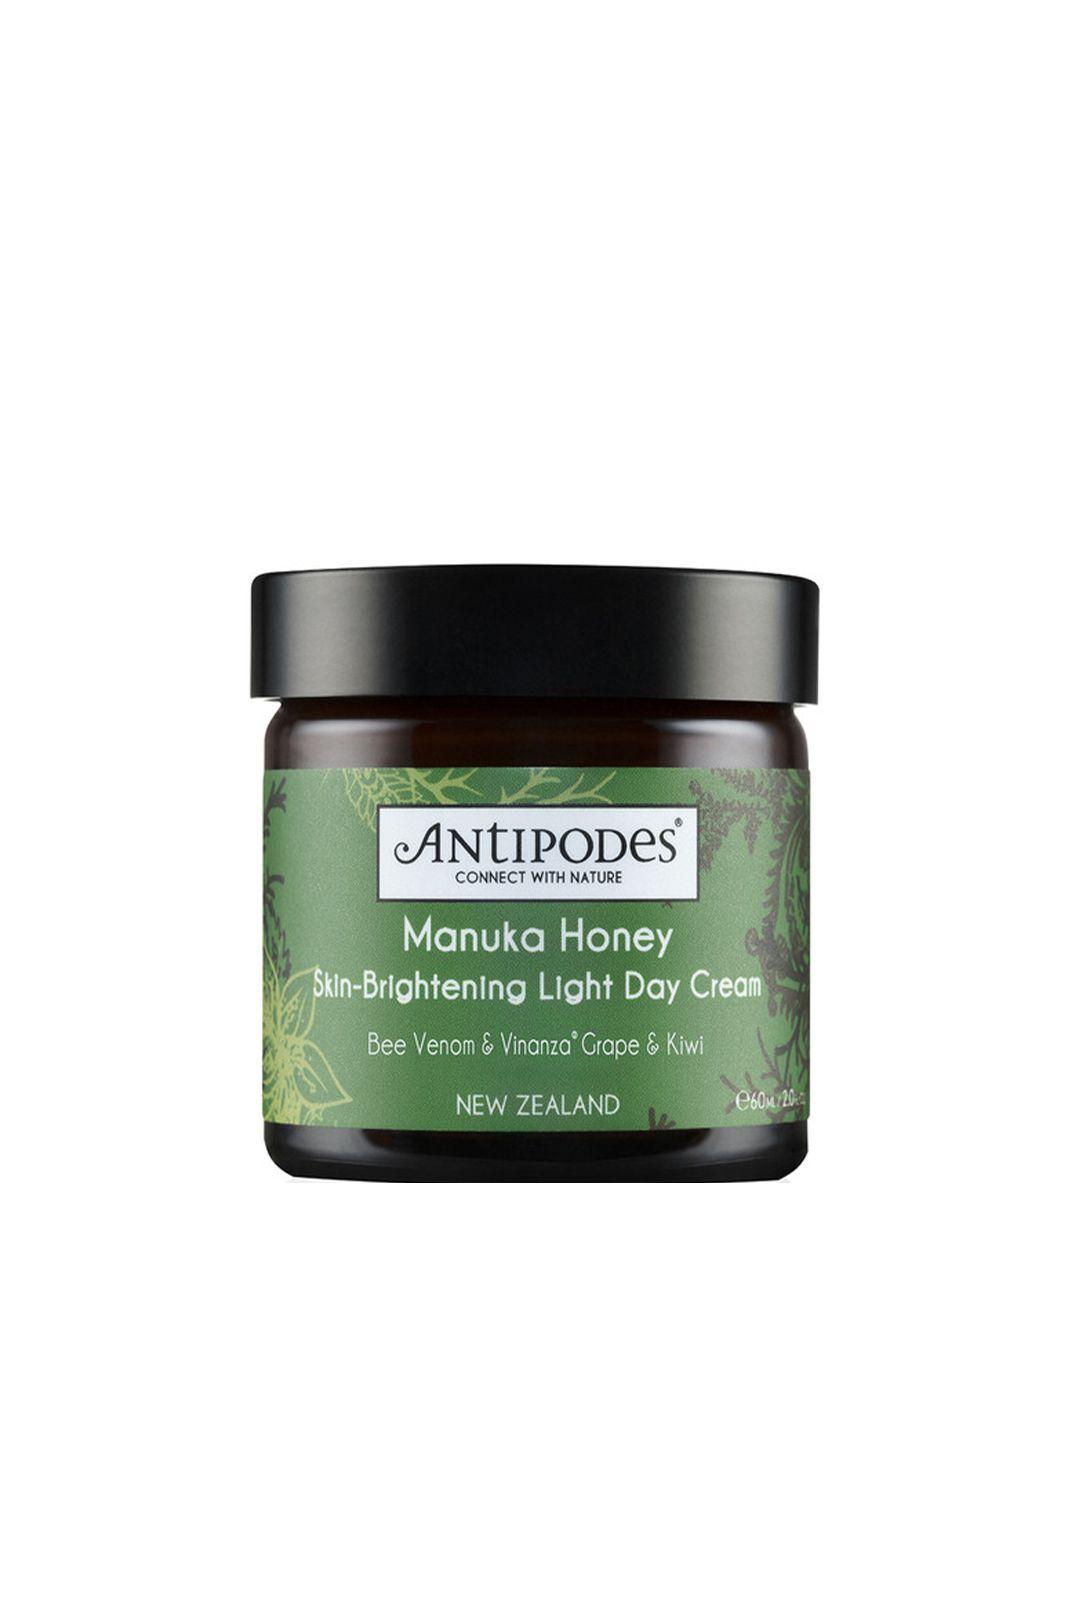 antipodes-manuka-honey-skin-brightening-light-day-cream-60ml